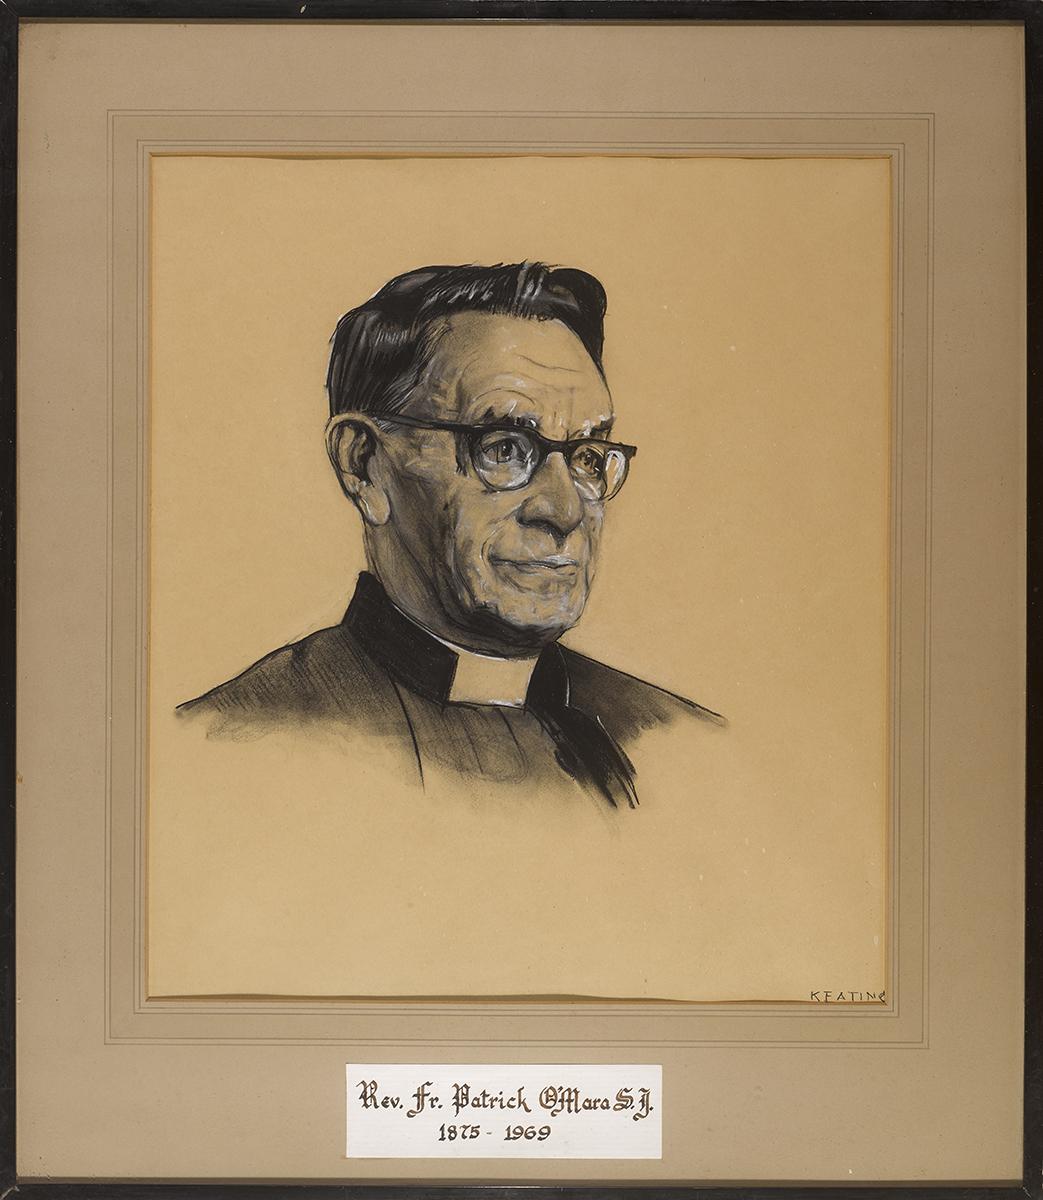 Lot 42 - Seán Keating PPRHA HRA HRSA (1889-1977)PORTRAIT OF REV. FR. PATRICK O'MARA S.J. (1875-1969) charcoal